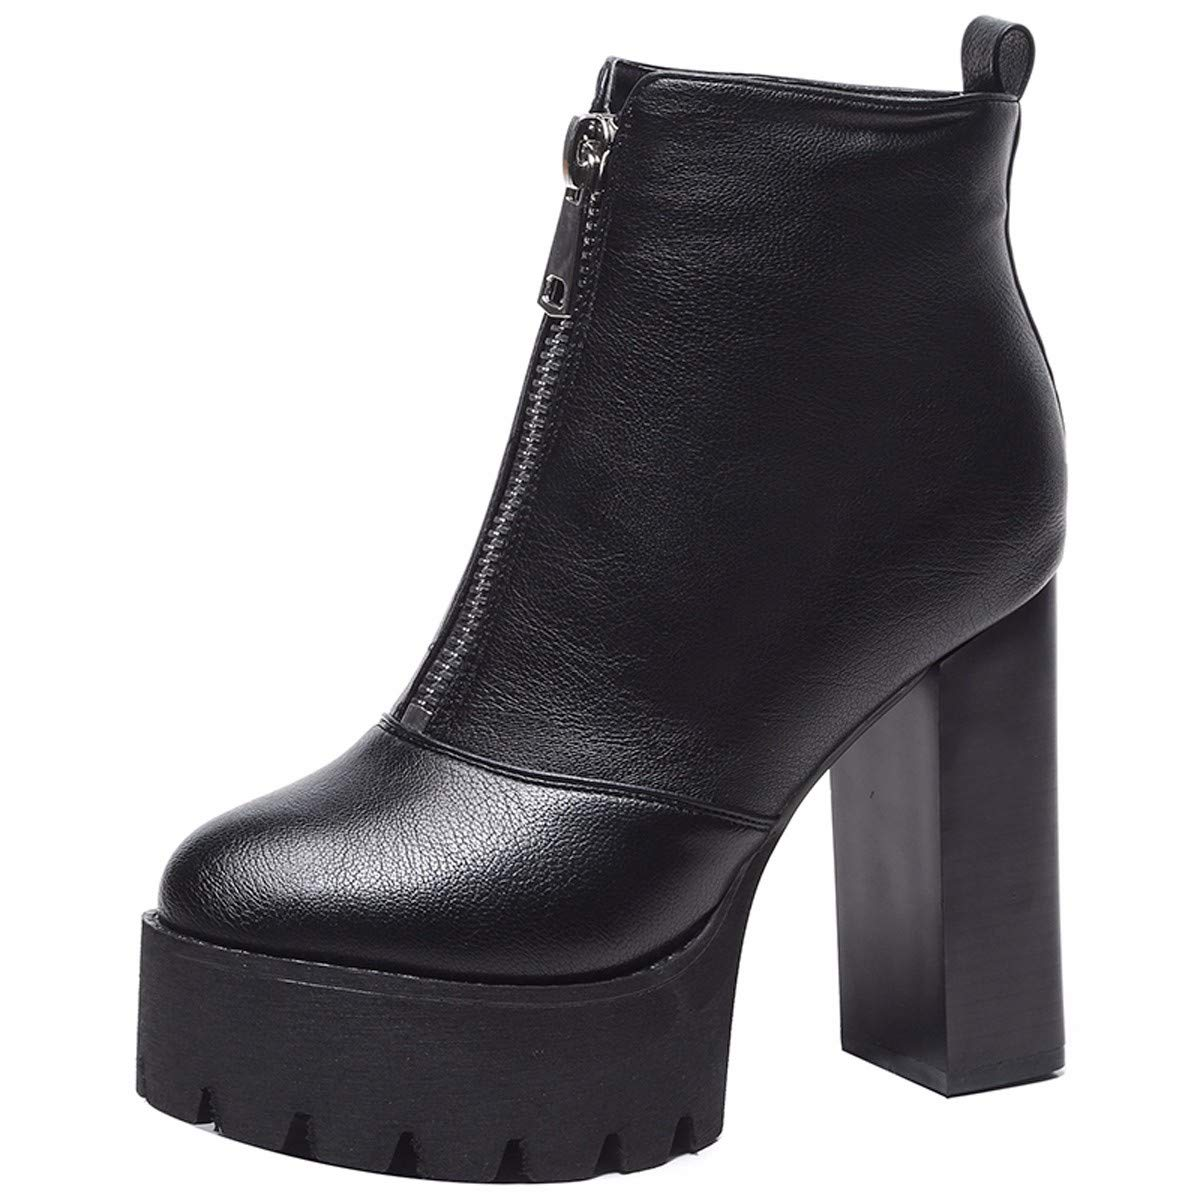 KPHY Damenschuhe Grob Hacken Stiefel cm Heel 11 cm Stiefel 100 Sätze Wasserdicht - Plattform - Reißverschluss Martin Stiefel 12a5d8